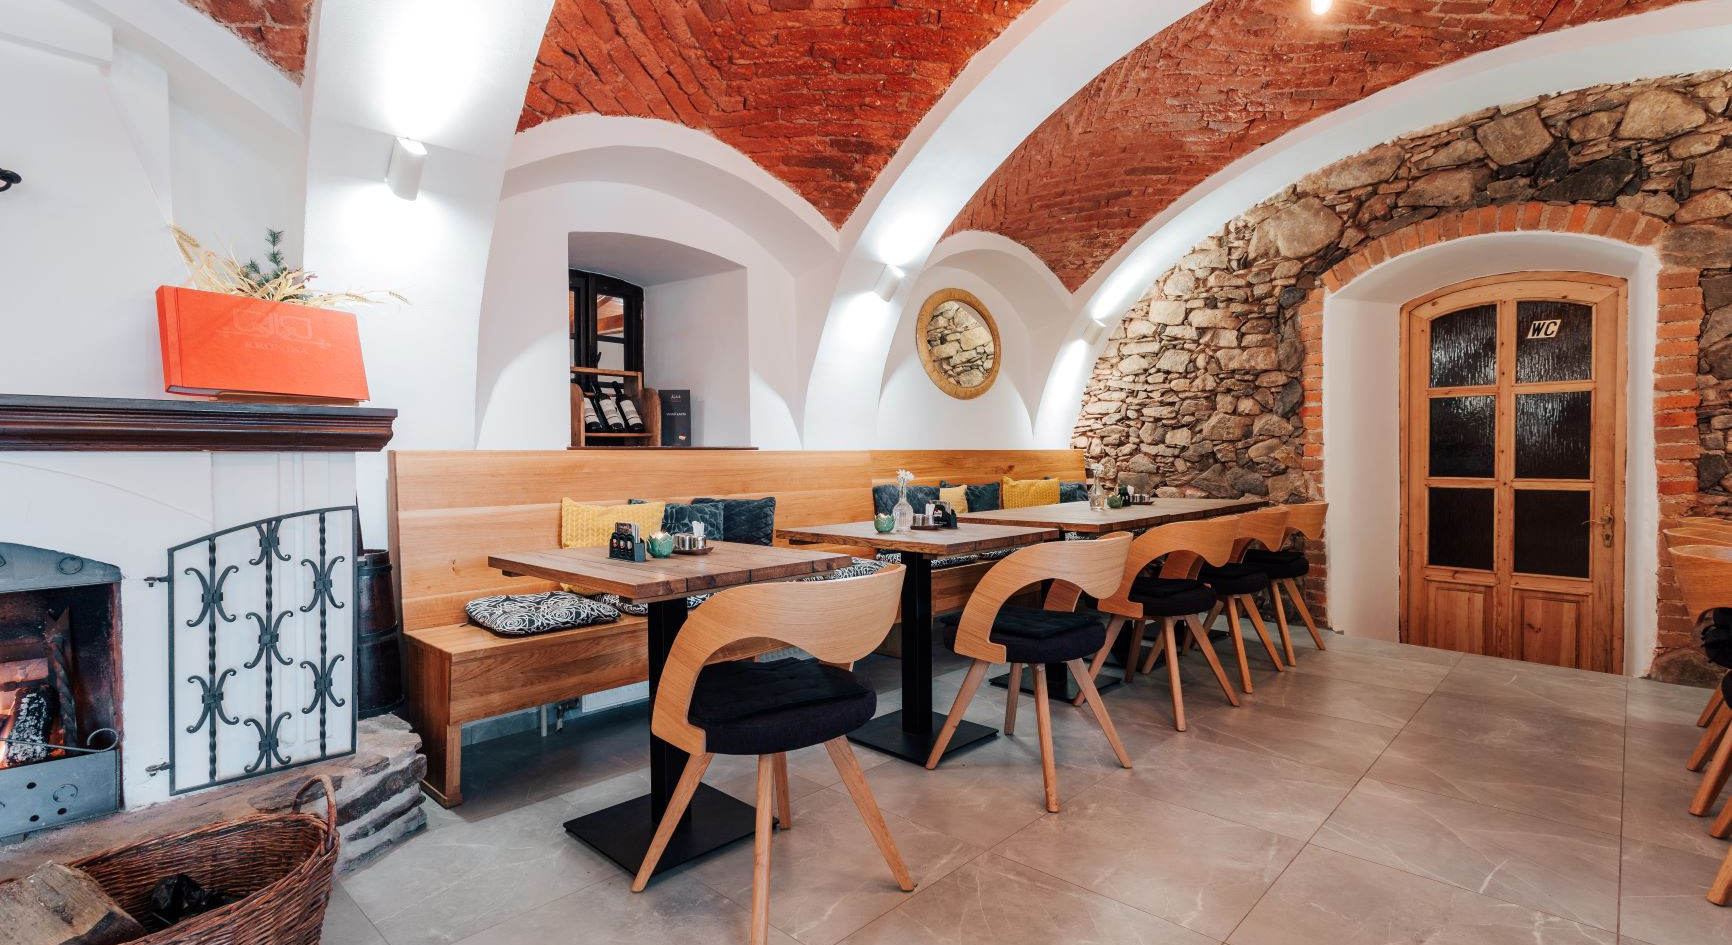 Restaurace u Reginy